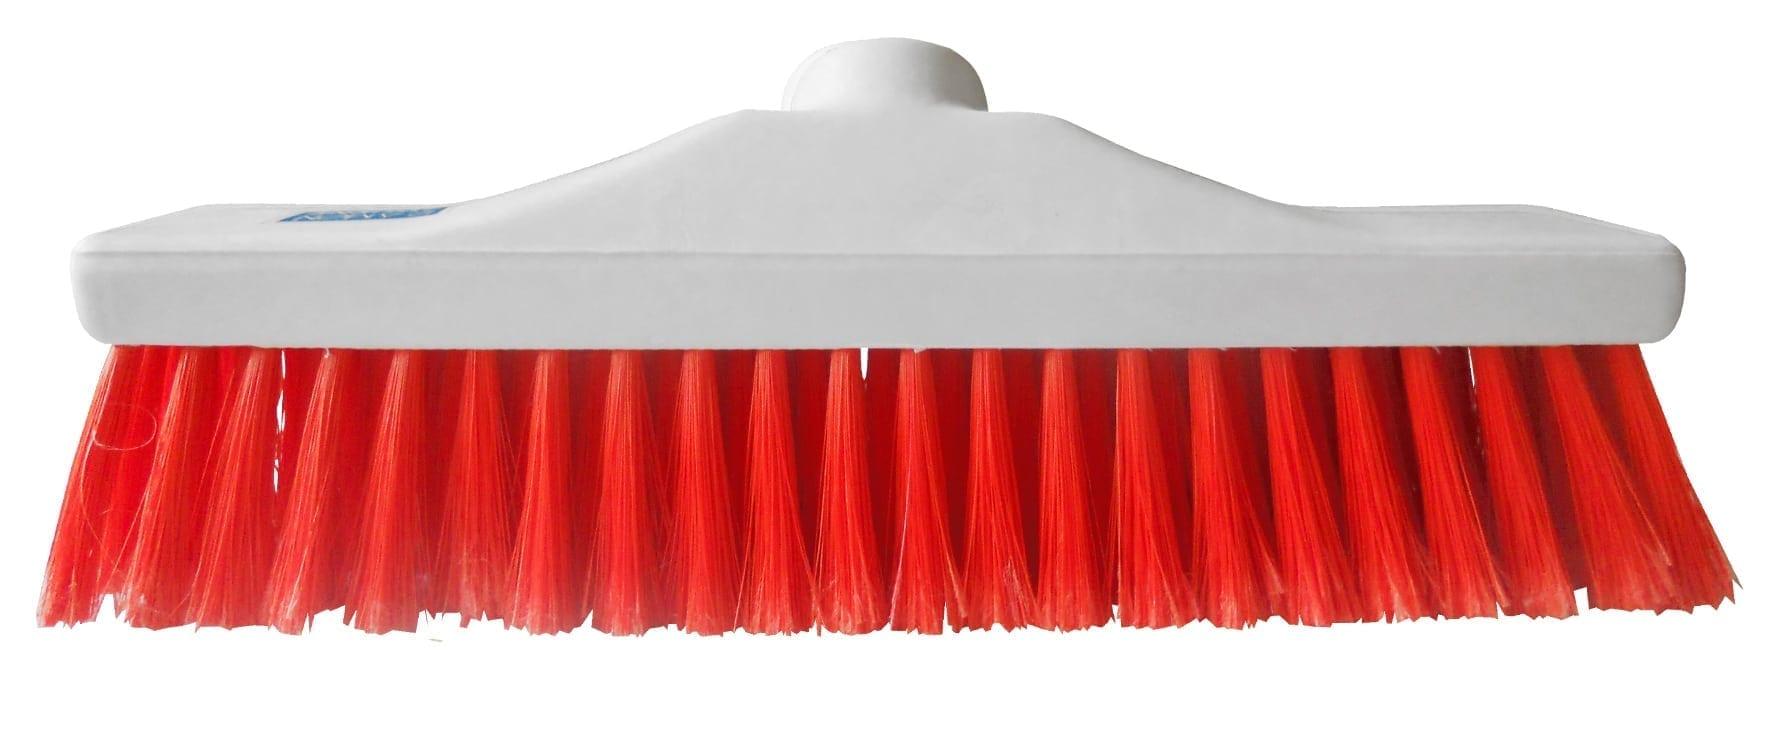 "Hygiene Brush Head 12"" - Soft Bristle - Red"